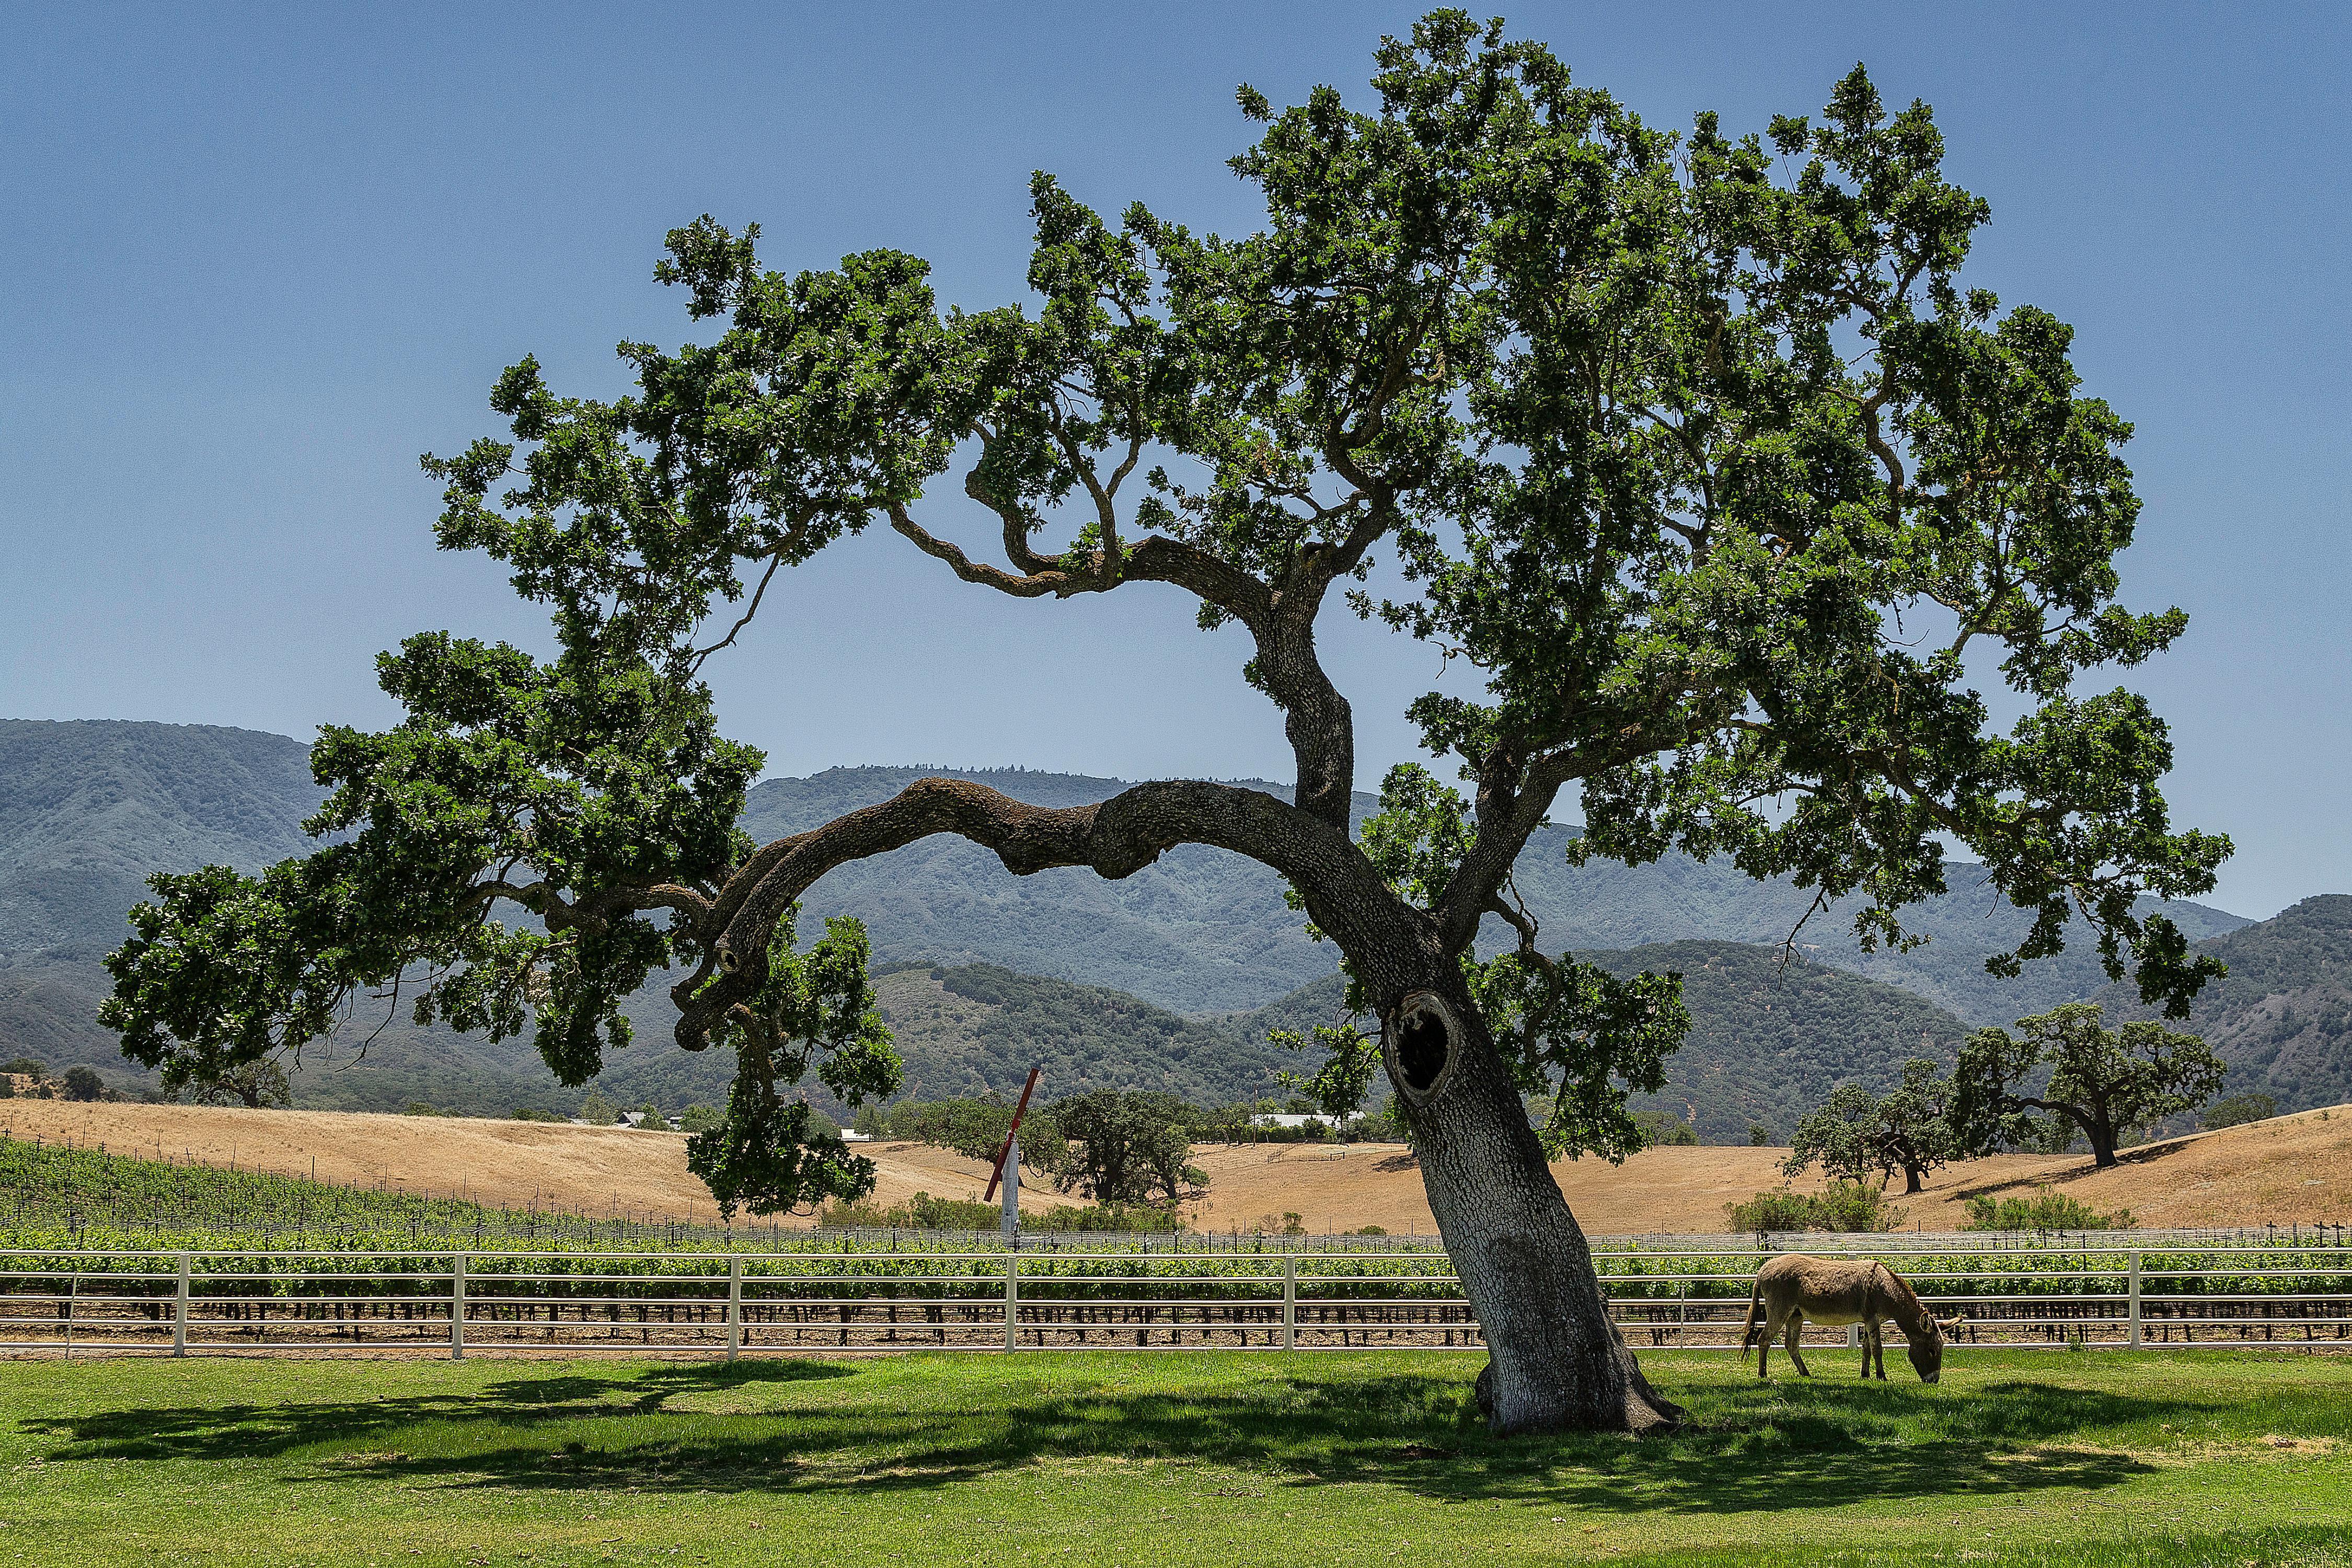 Horse Ranch in the Santa Ynez Valley